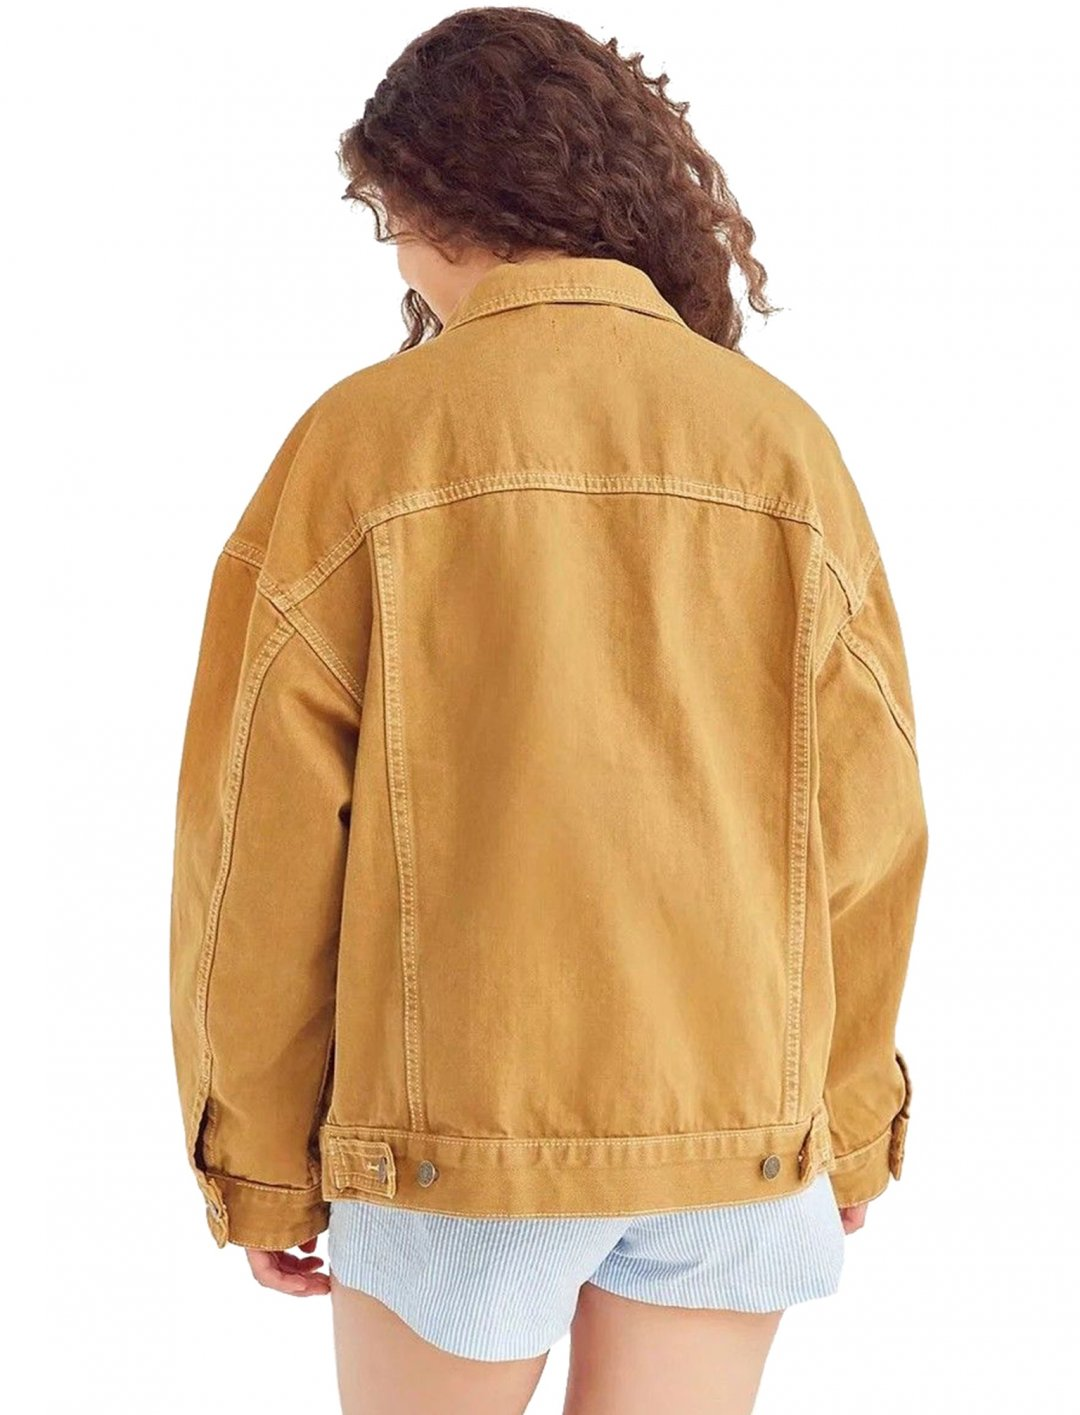 "Boyfriend Oversize Jacket {""id"":5,""product_section_id"":1,""name"":""Clothing"",""order"":5}"